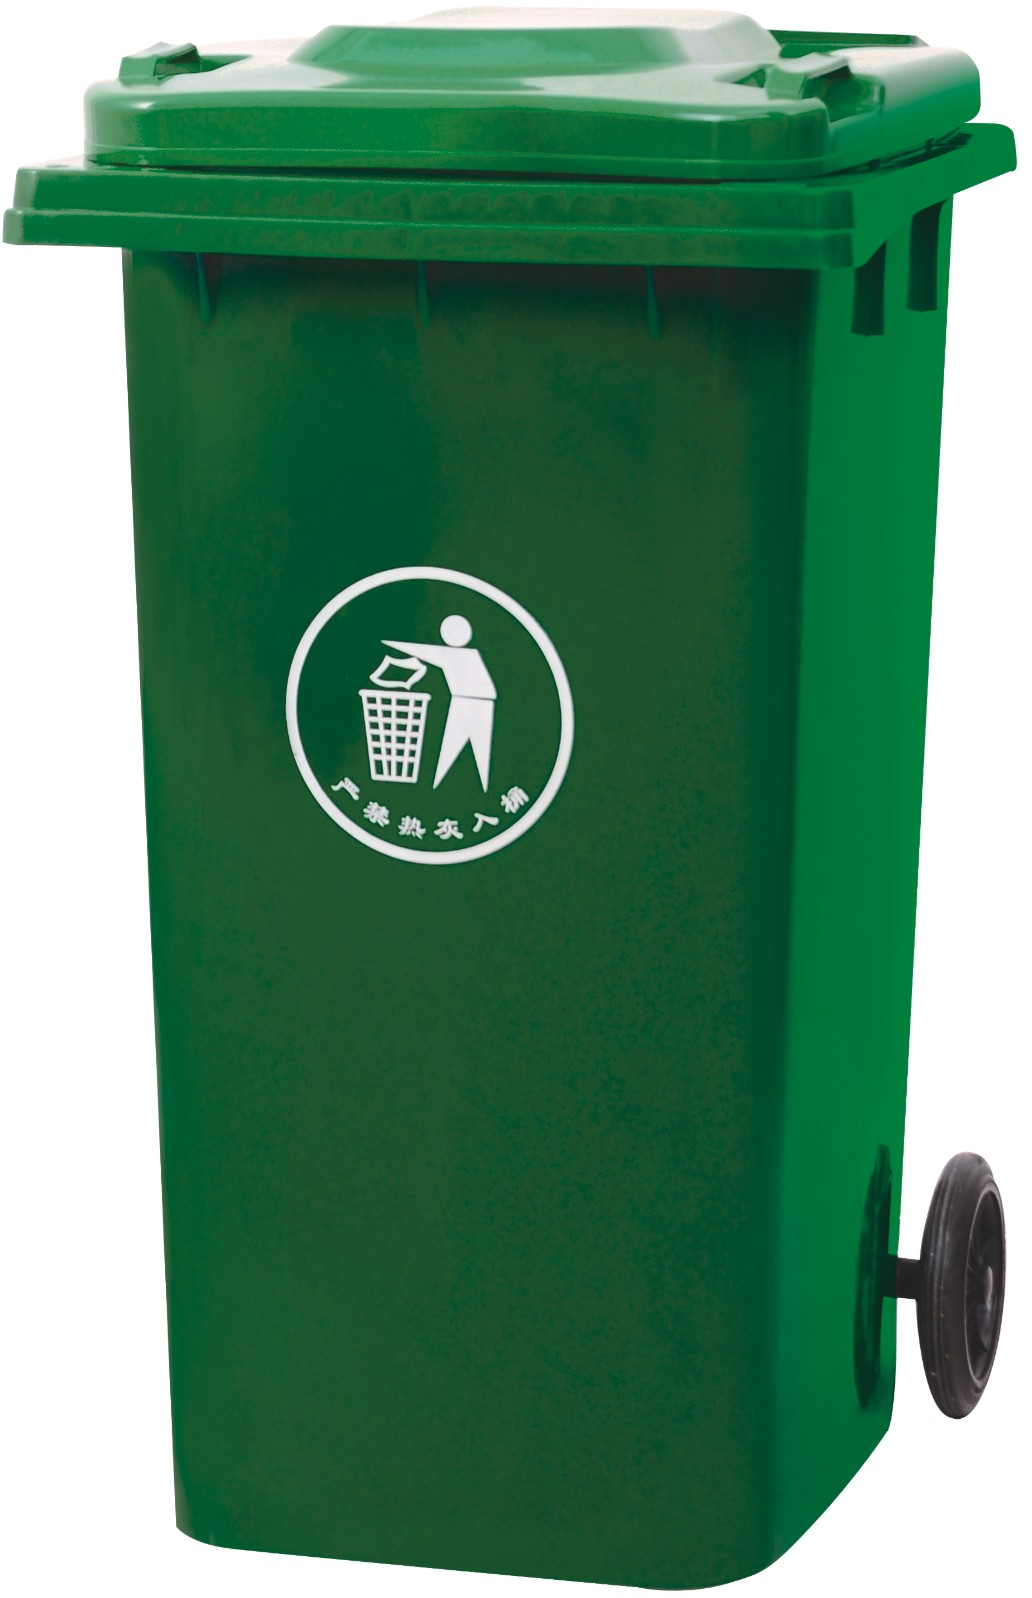 Groene kleur zorgt voor meer afval